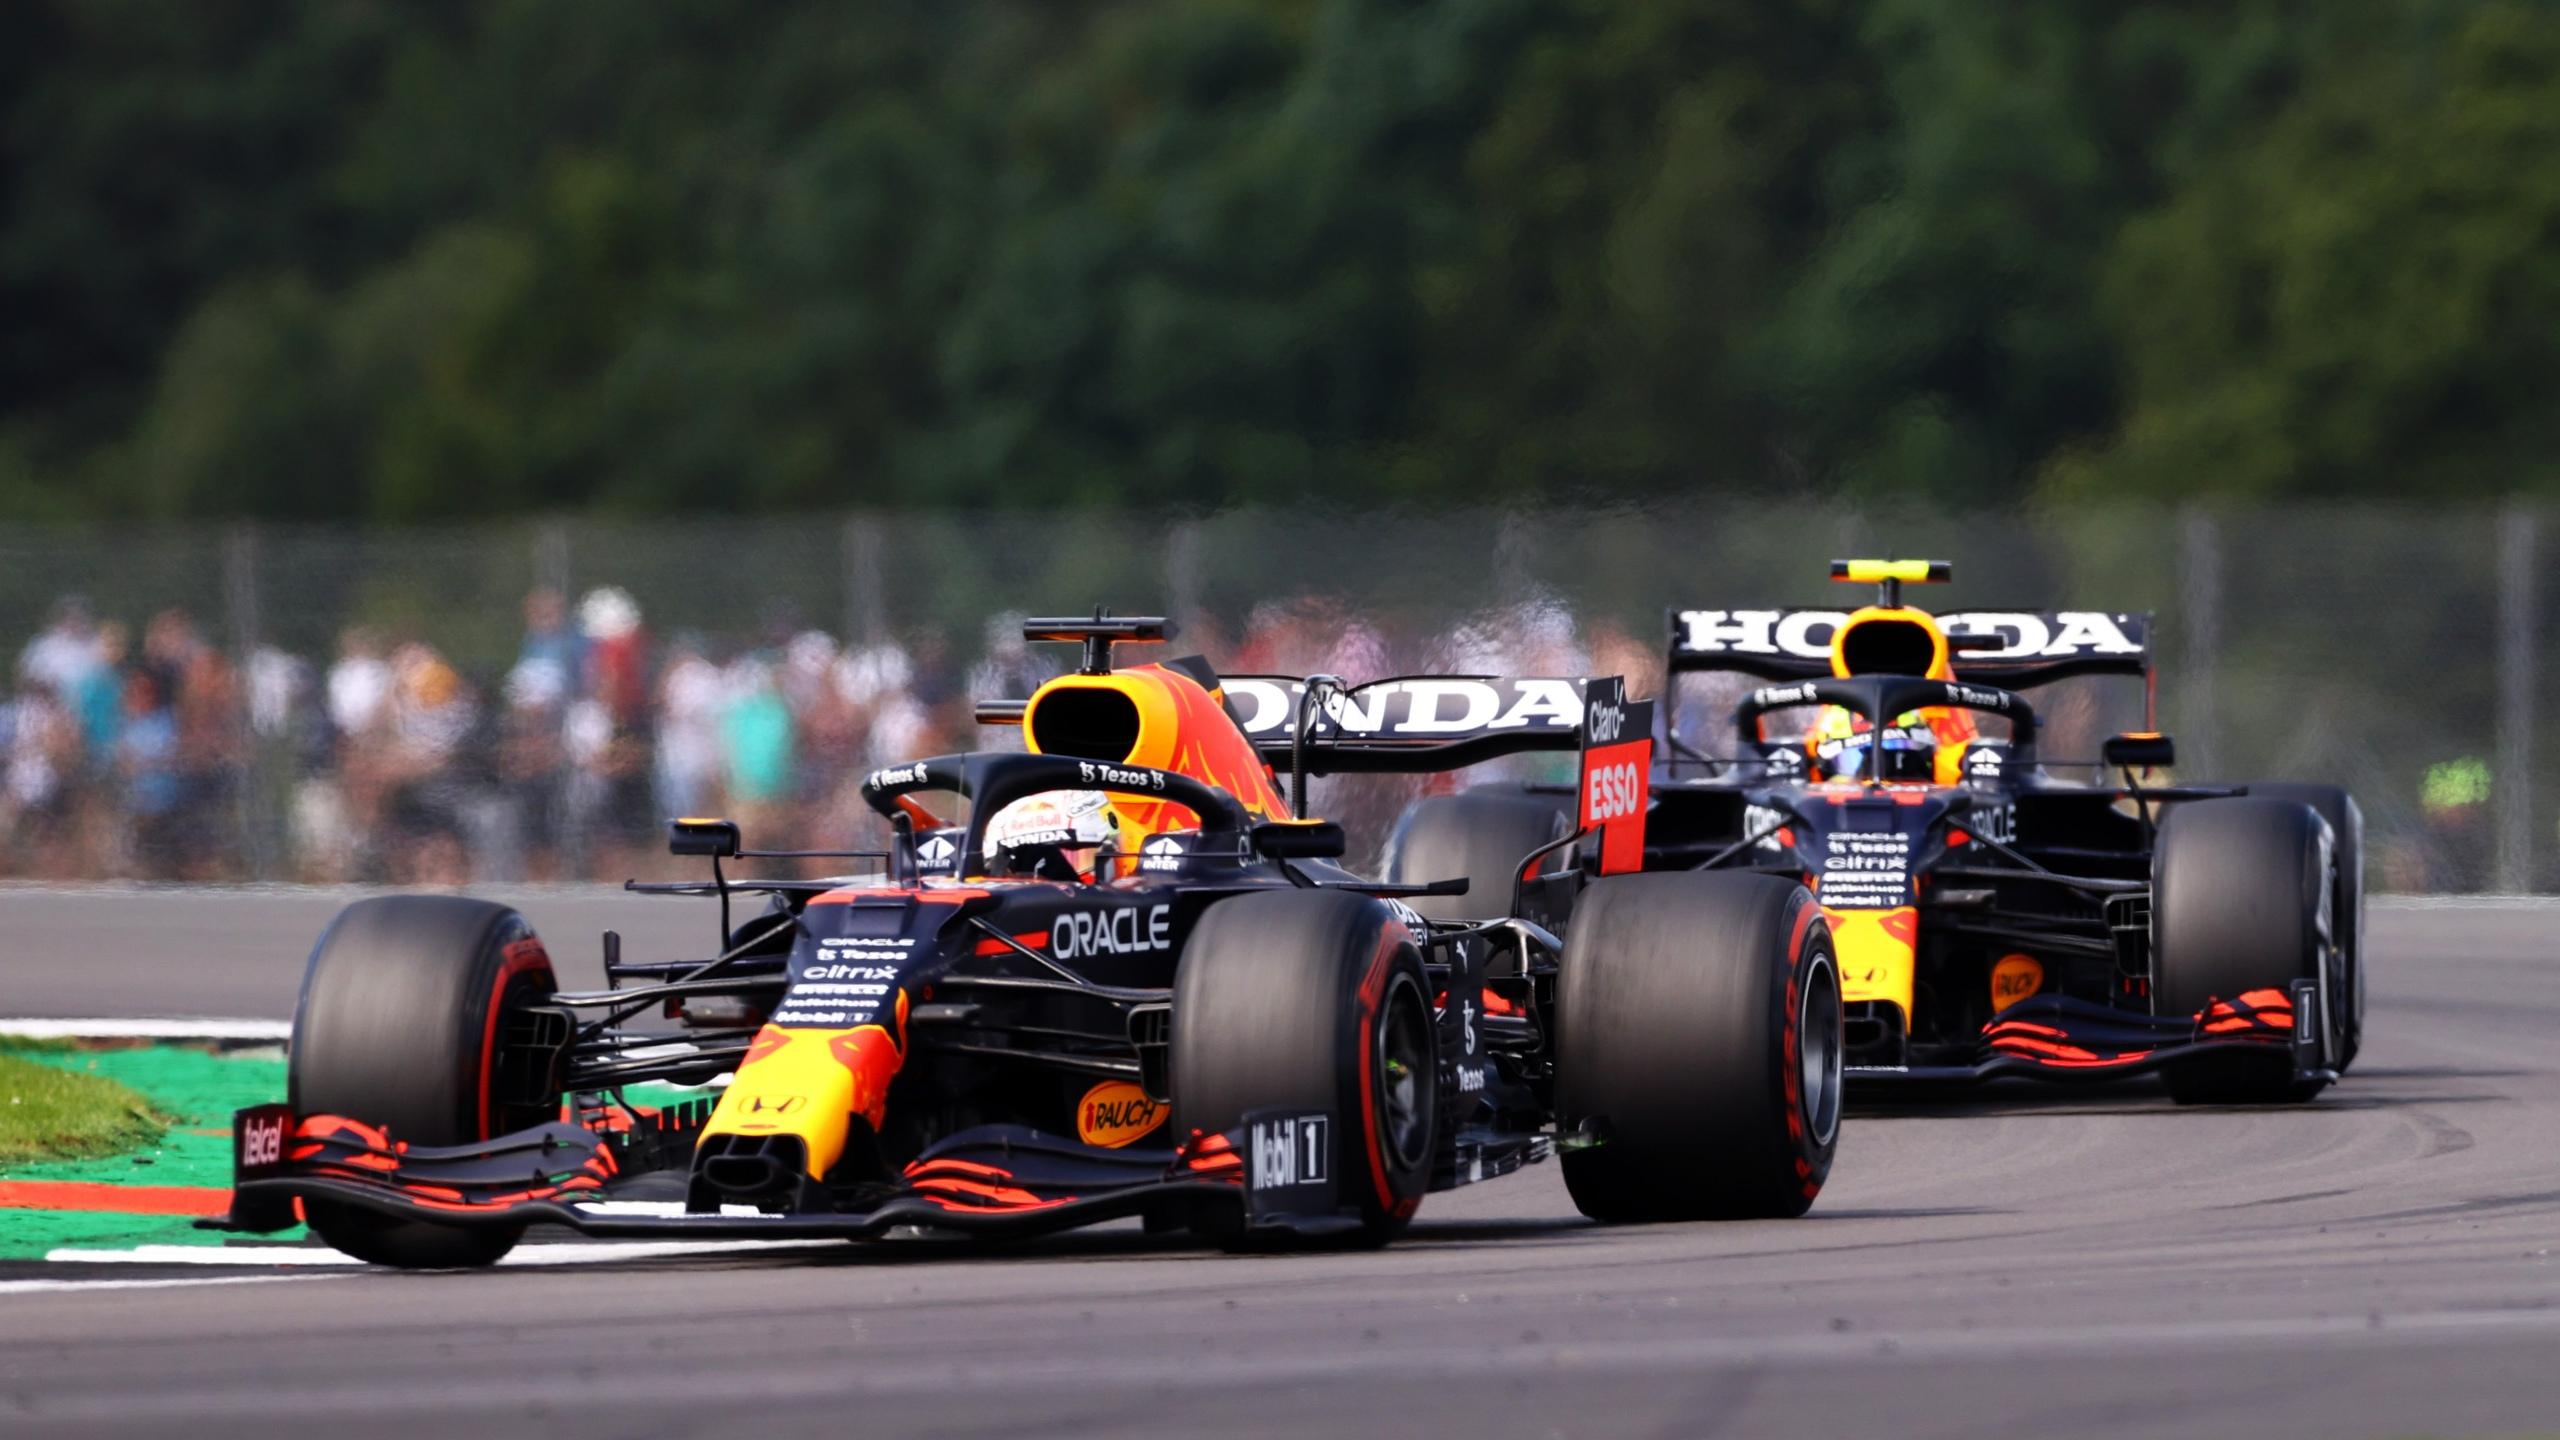 Команда Red Bull осталась без очков по итогам гран-при Великобритании 2021 года